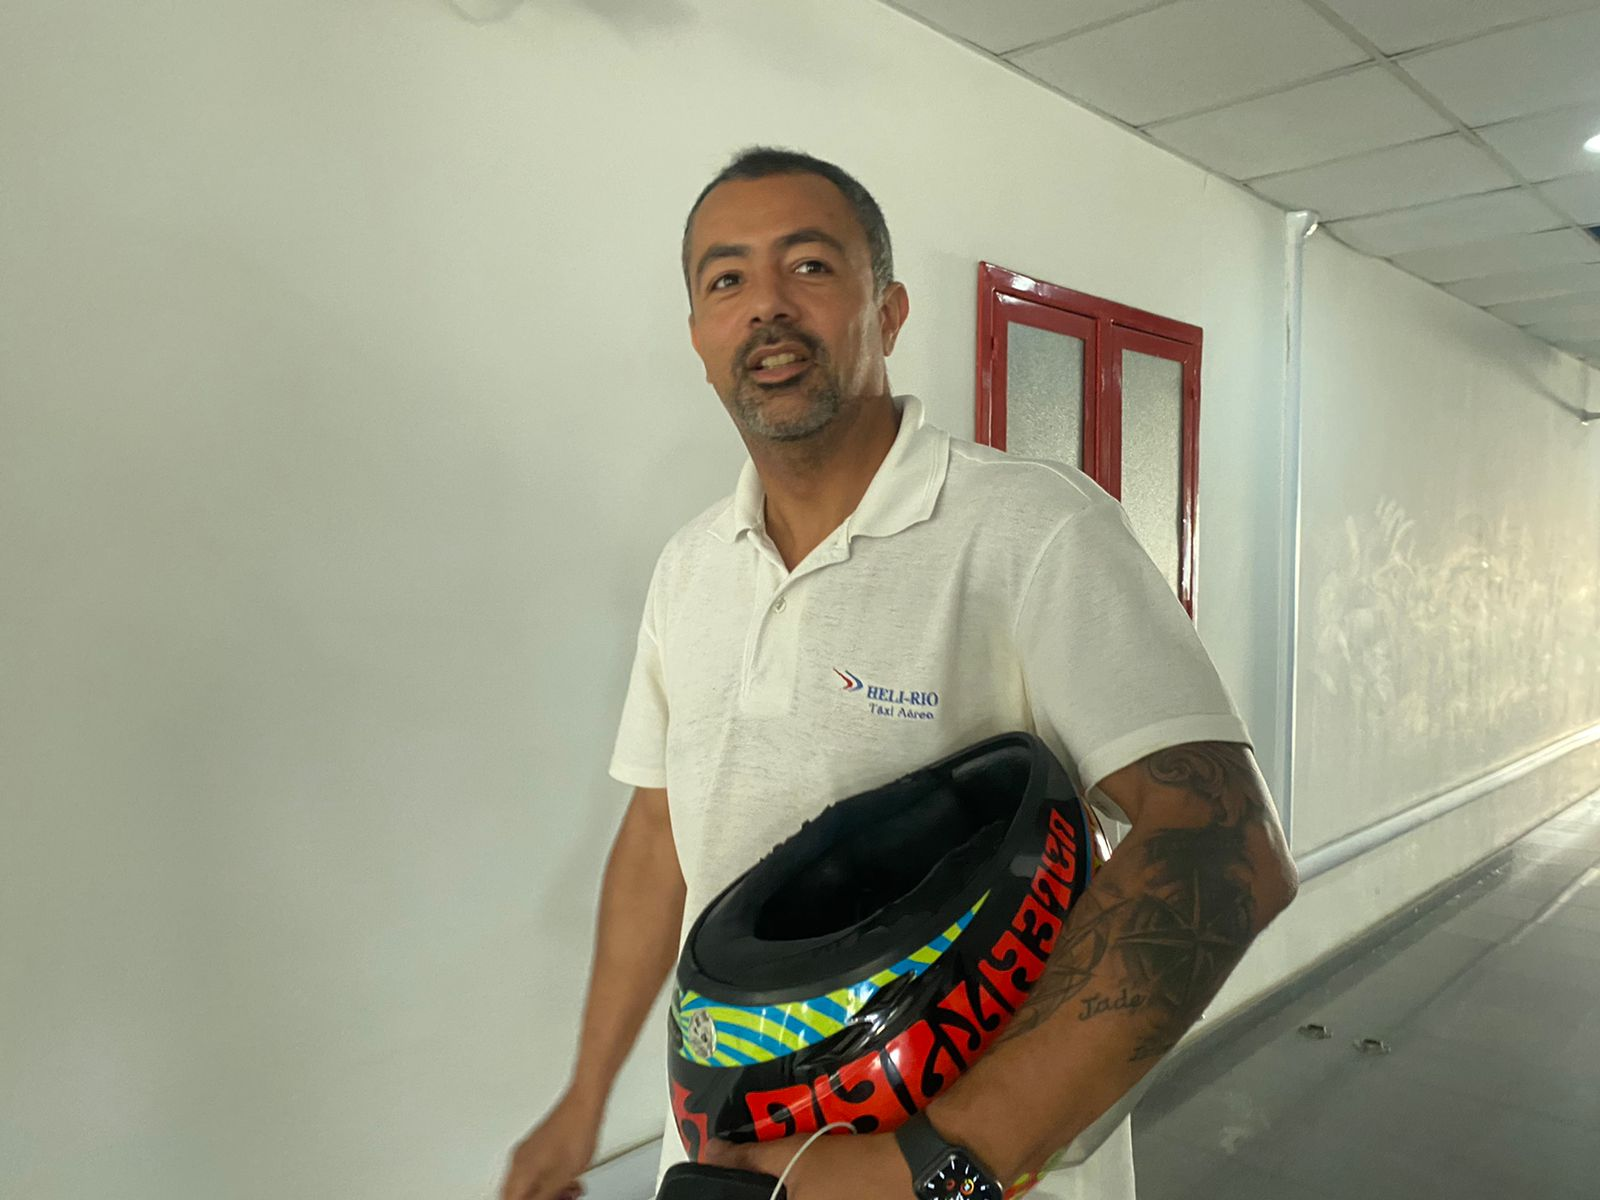 Piloto de helicóptero André Guerra